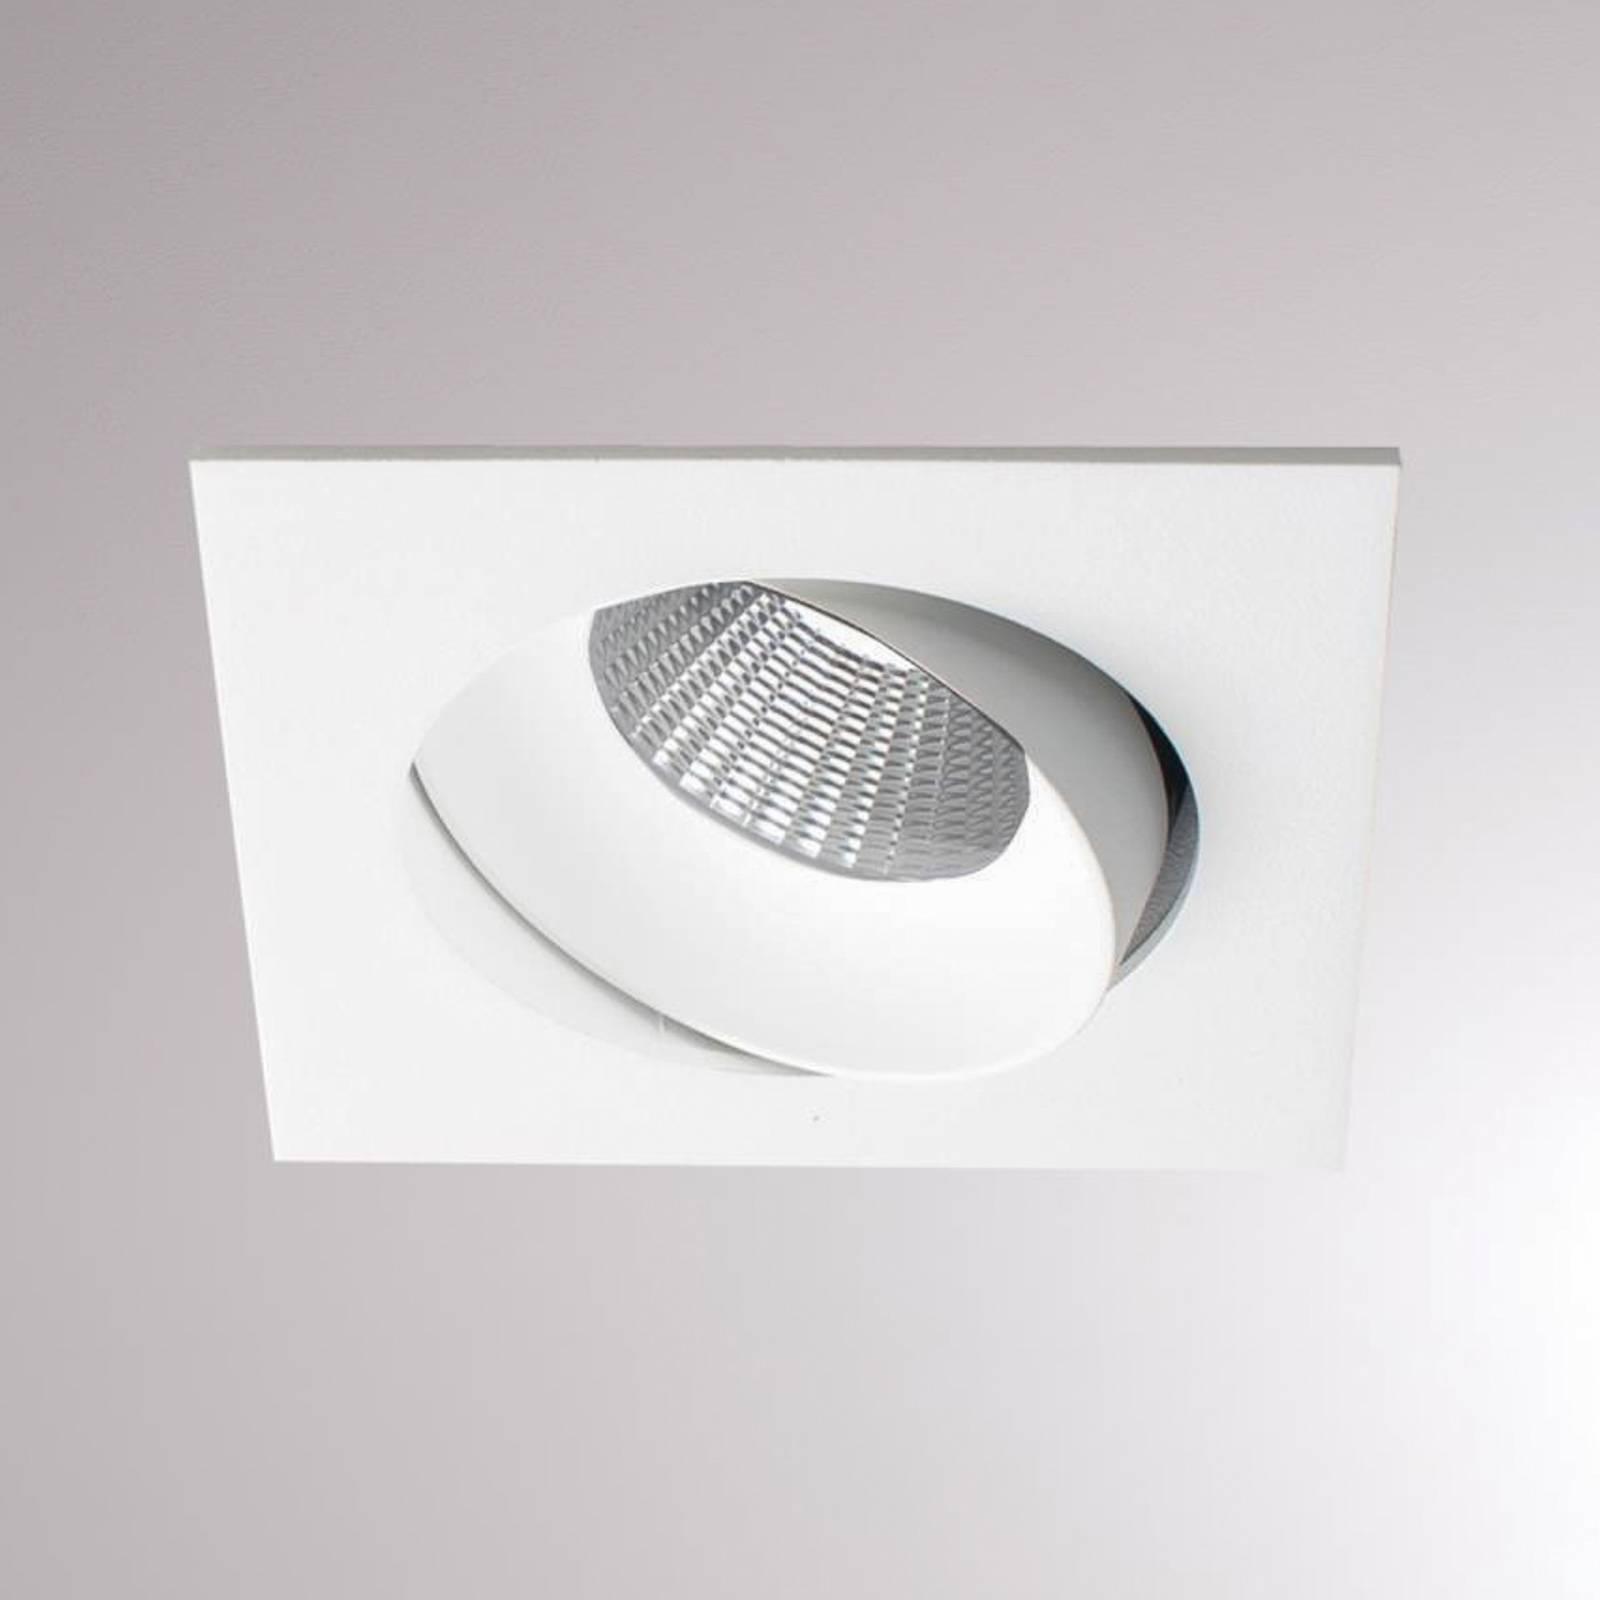 LOUM Kalio -LED-uppovalo kulmikas 2700K valkoinen